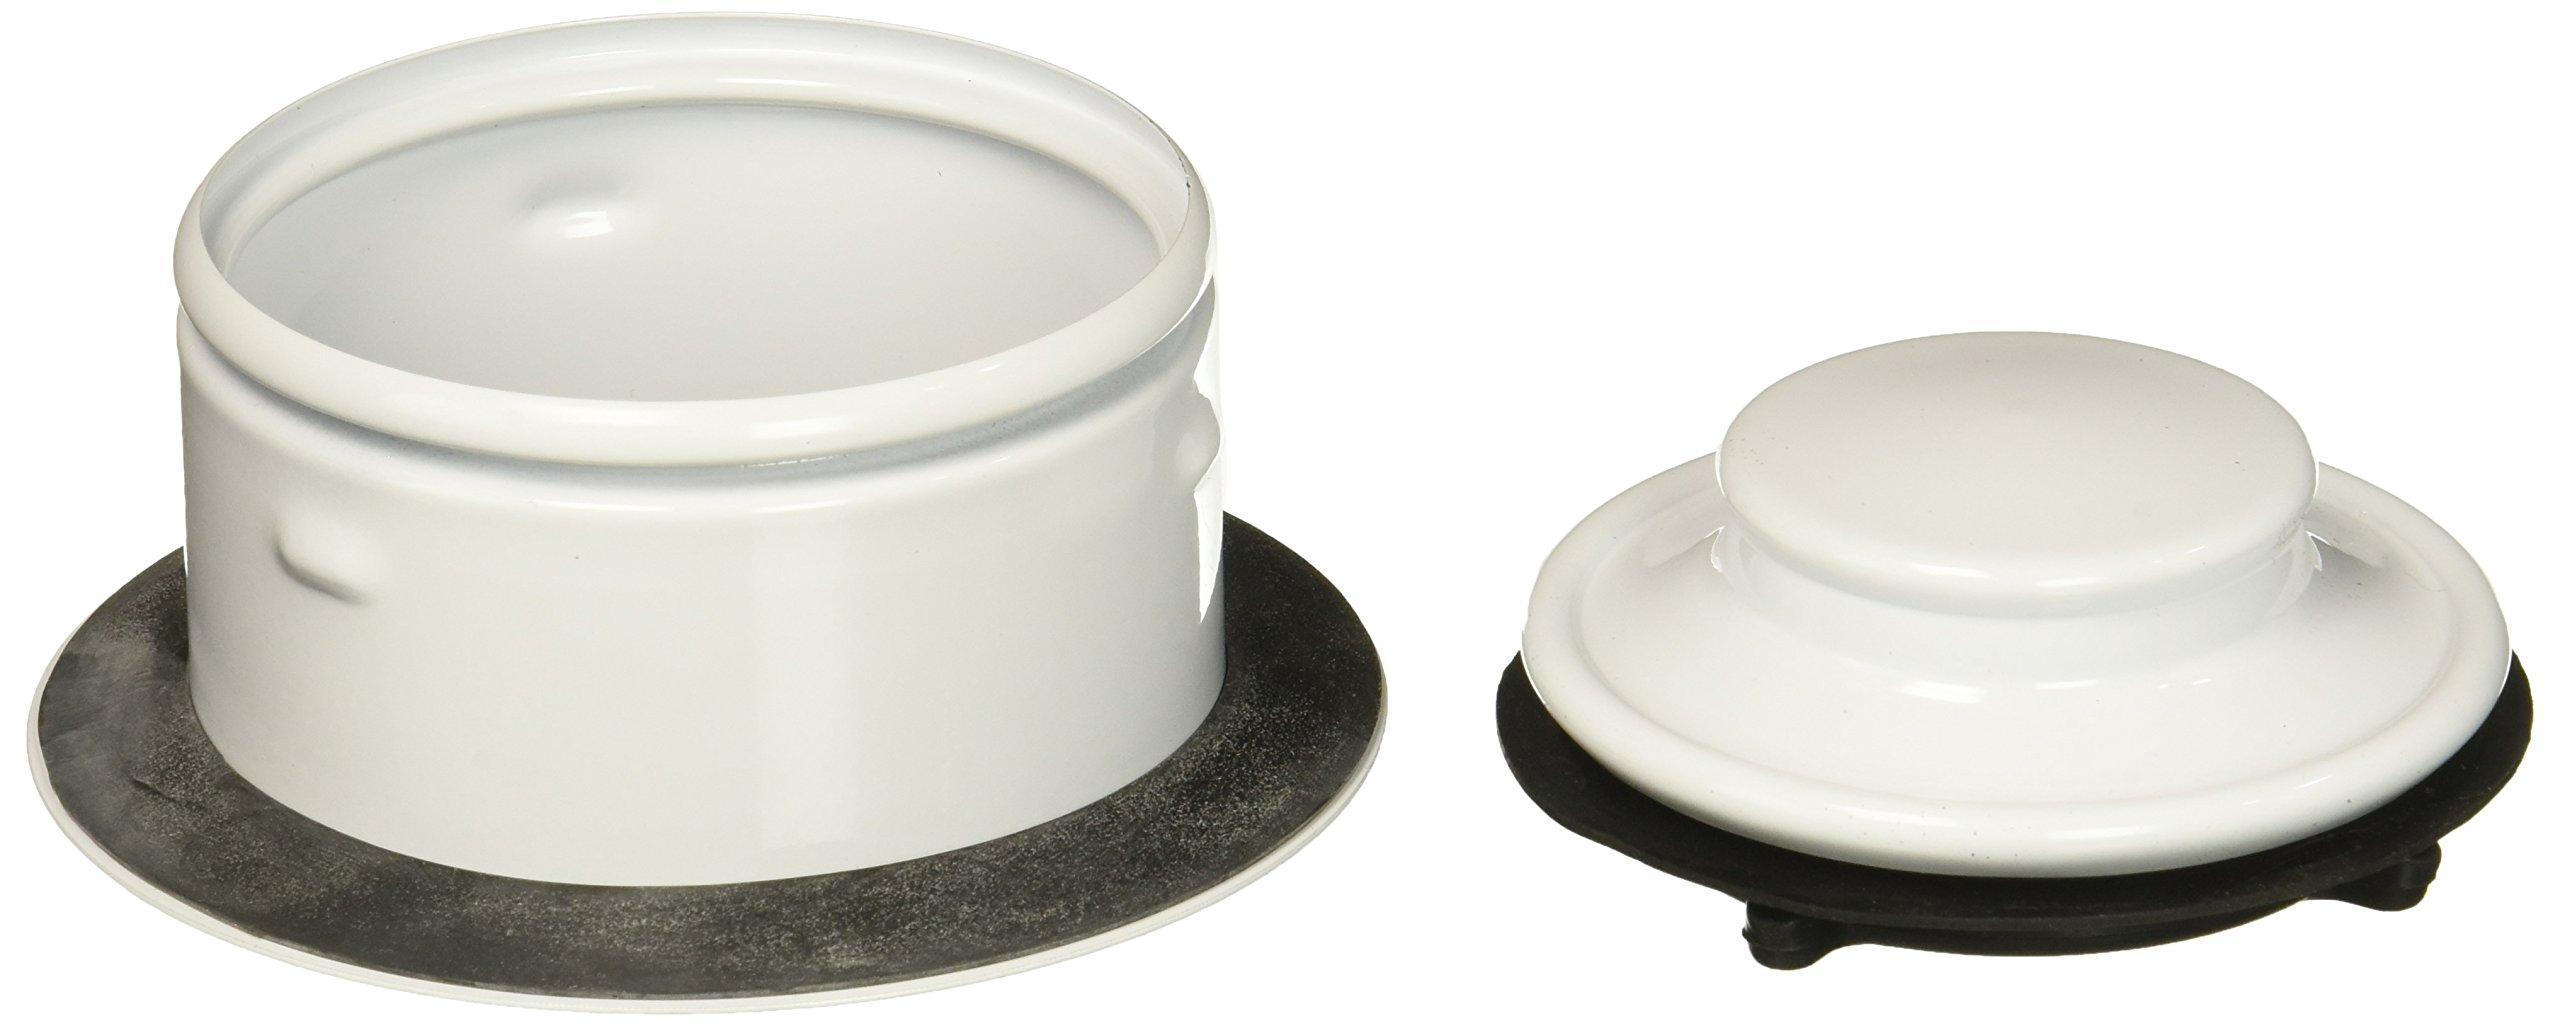 Waste King 3152 3150 Extended Sink flange, White